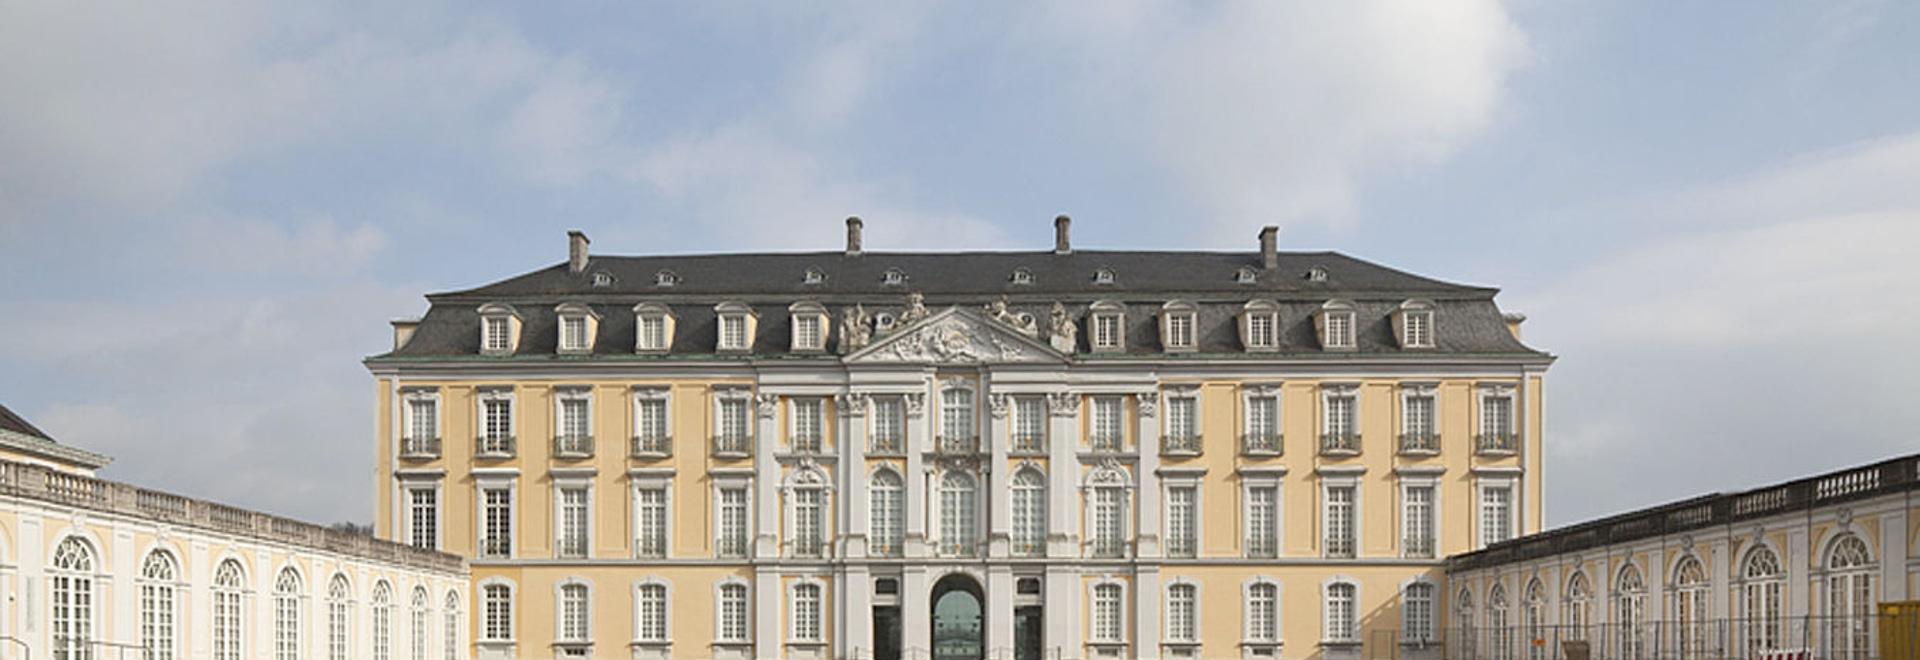 Terrace of Augustusburg Castle restored with Triflex liquid applied waterproofing